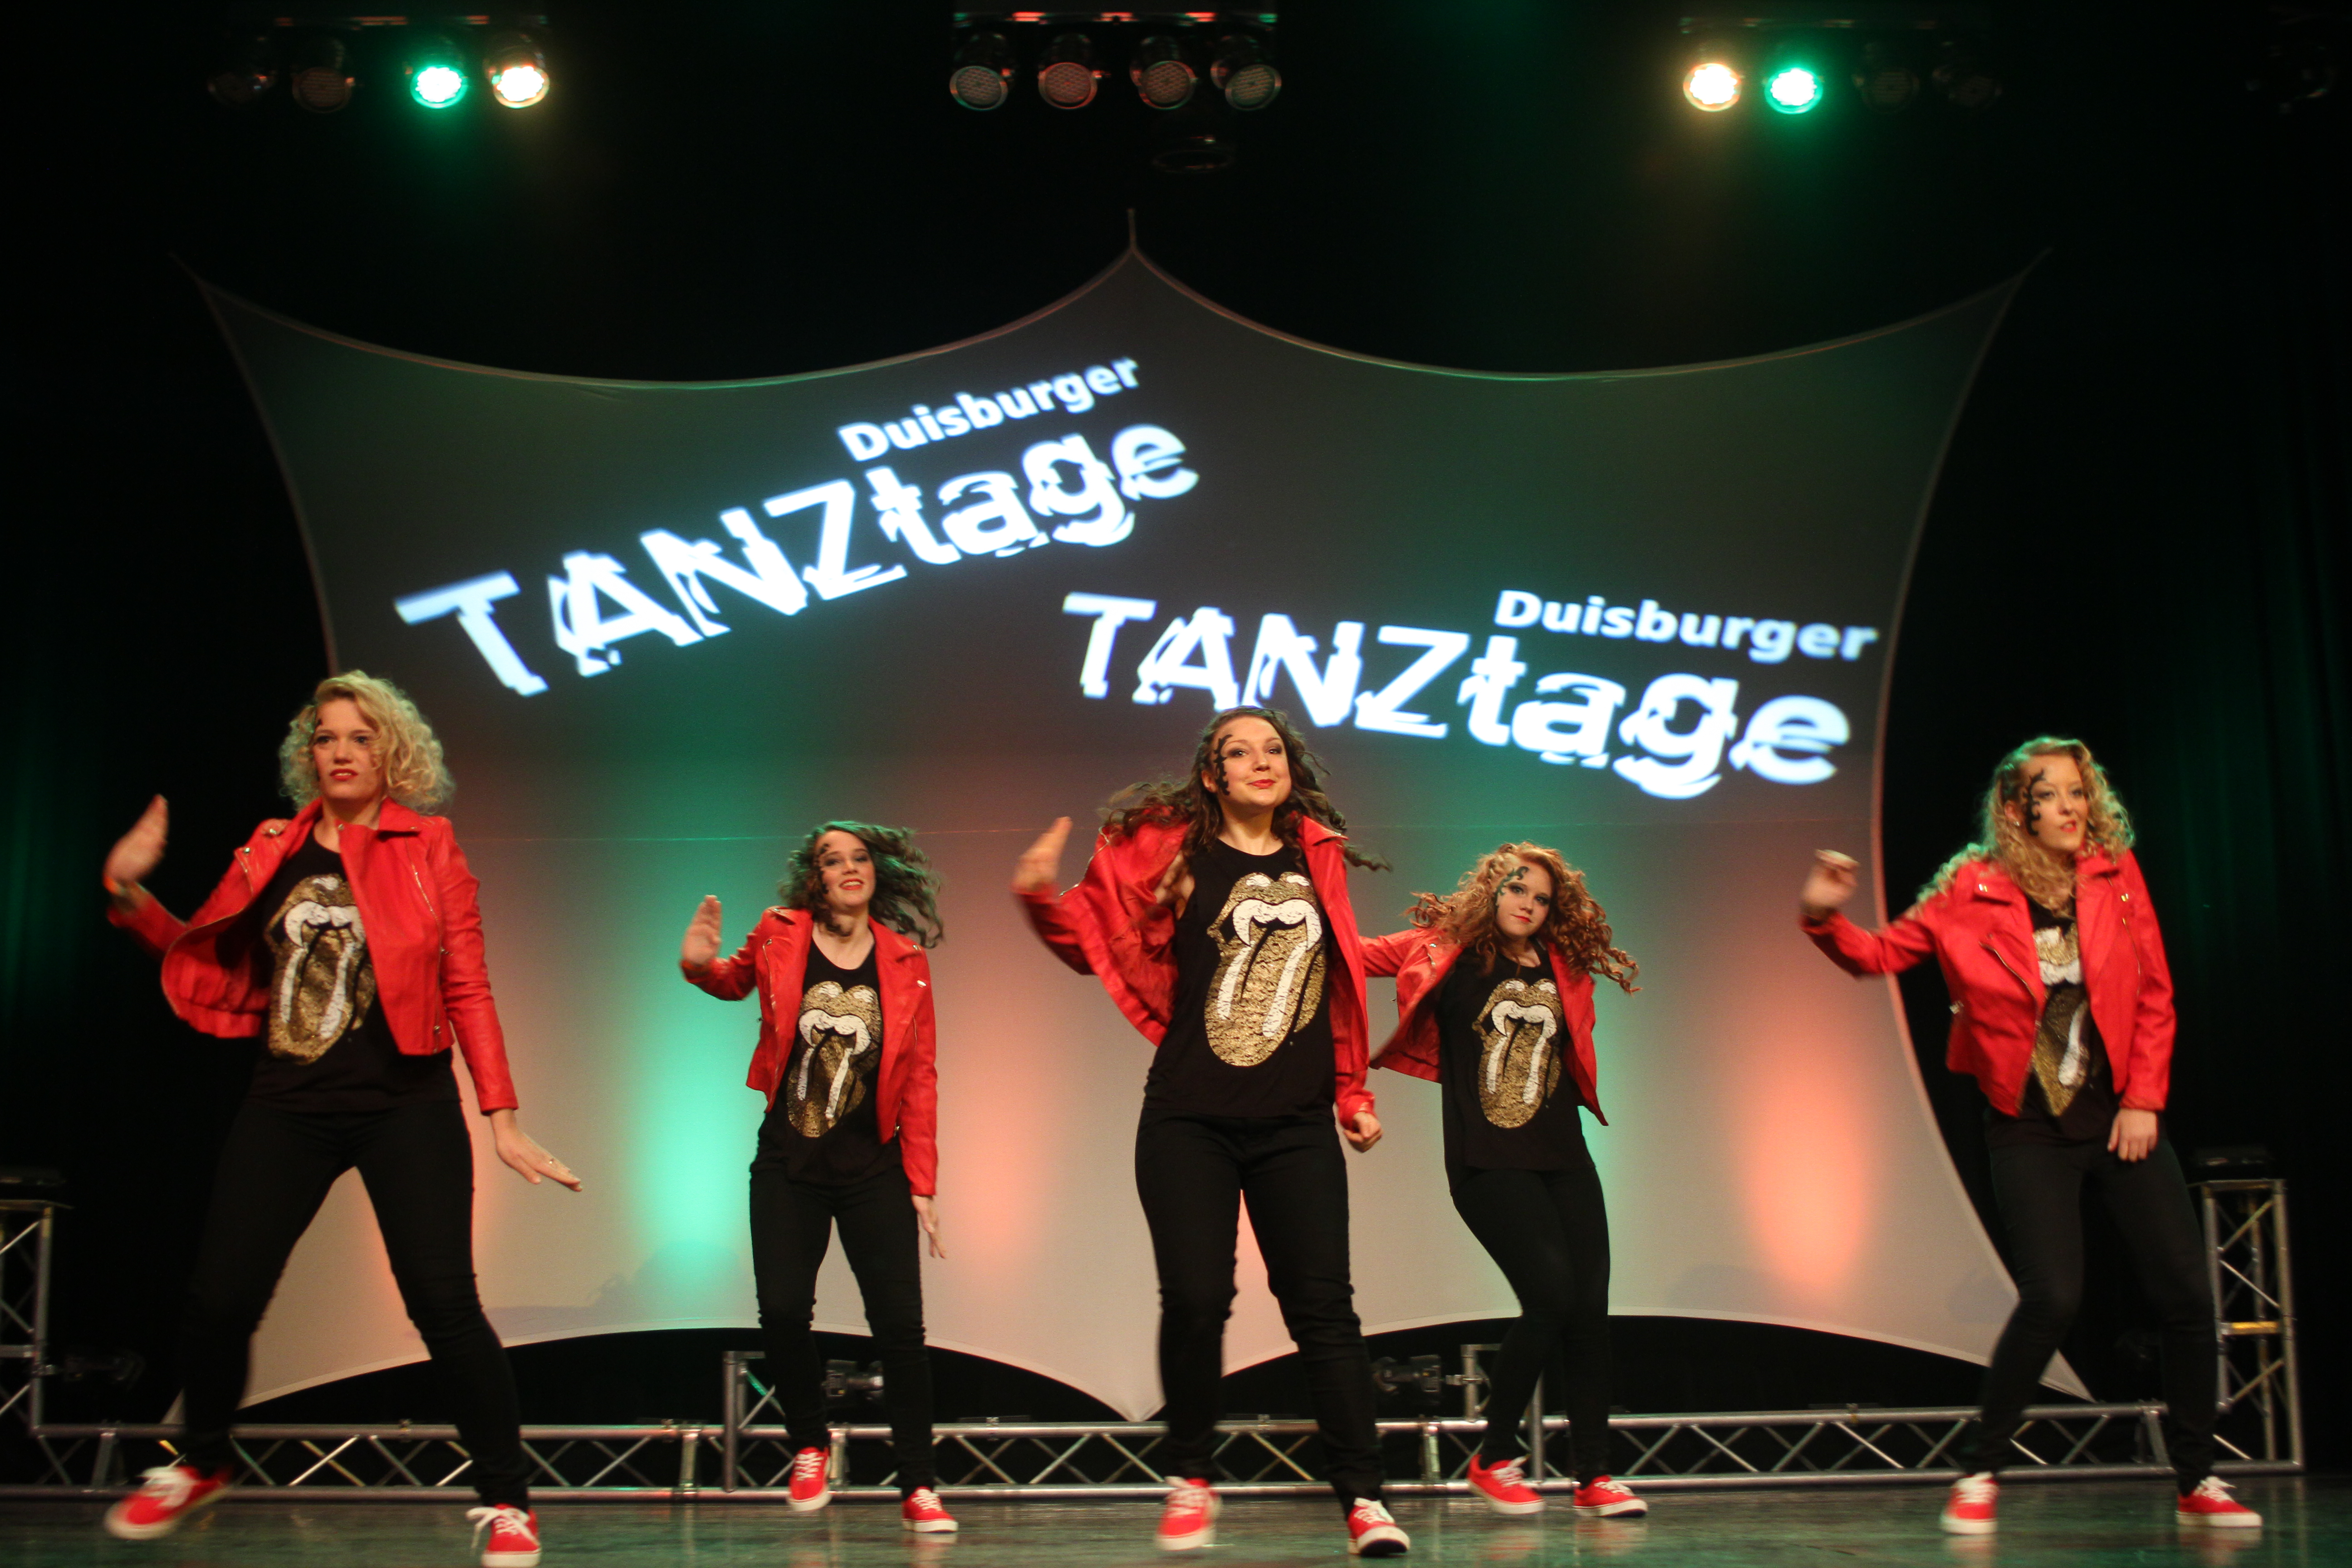 Duisburger Tanztage 2013